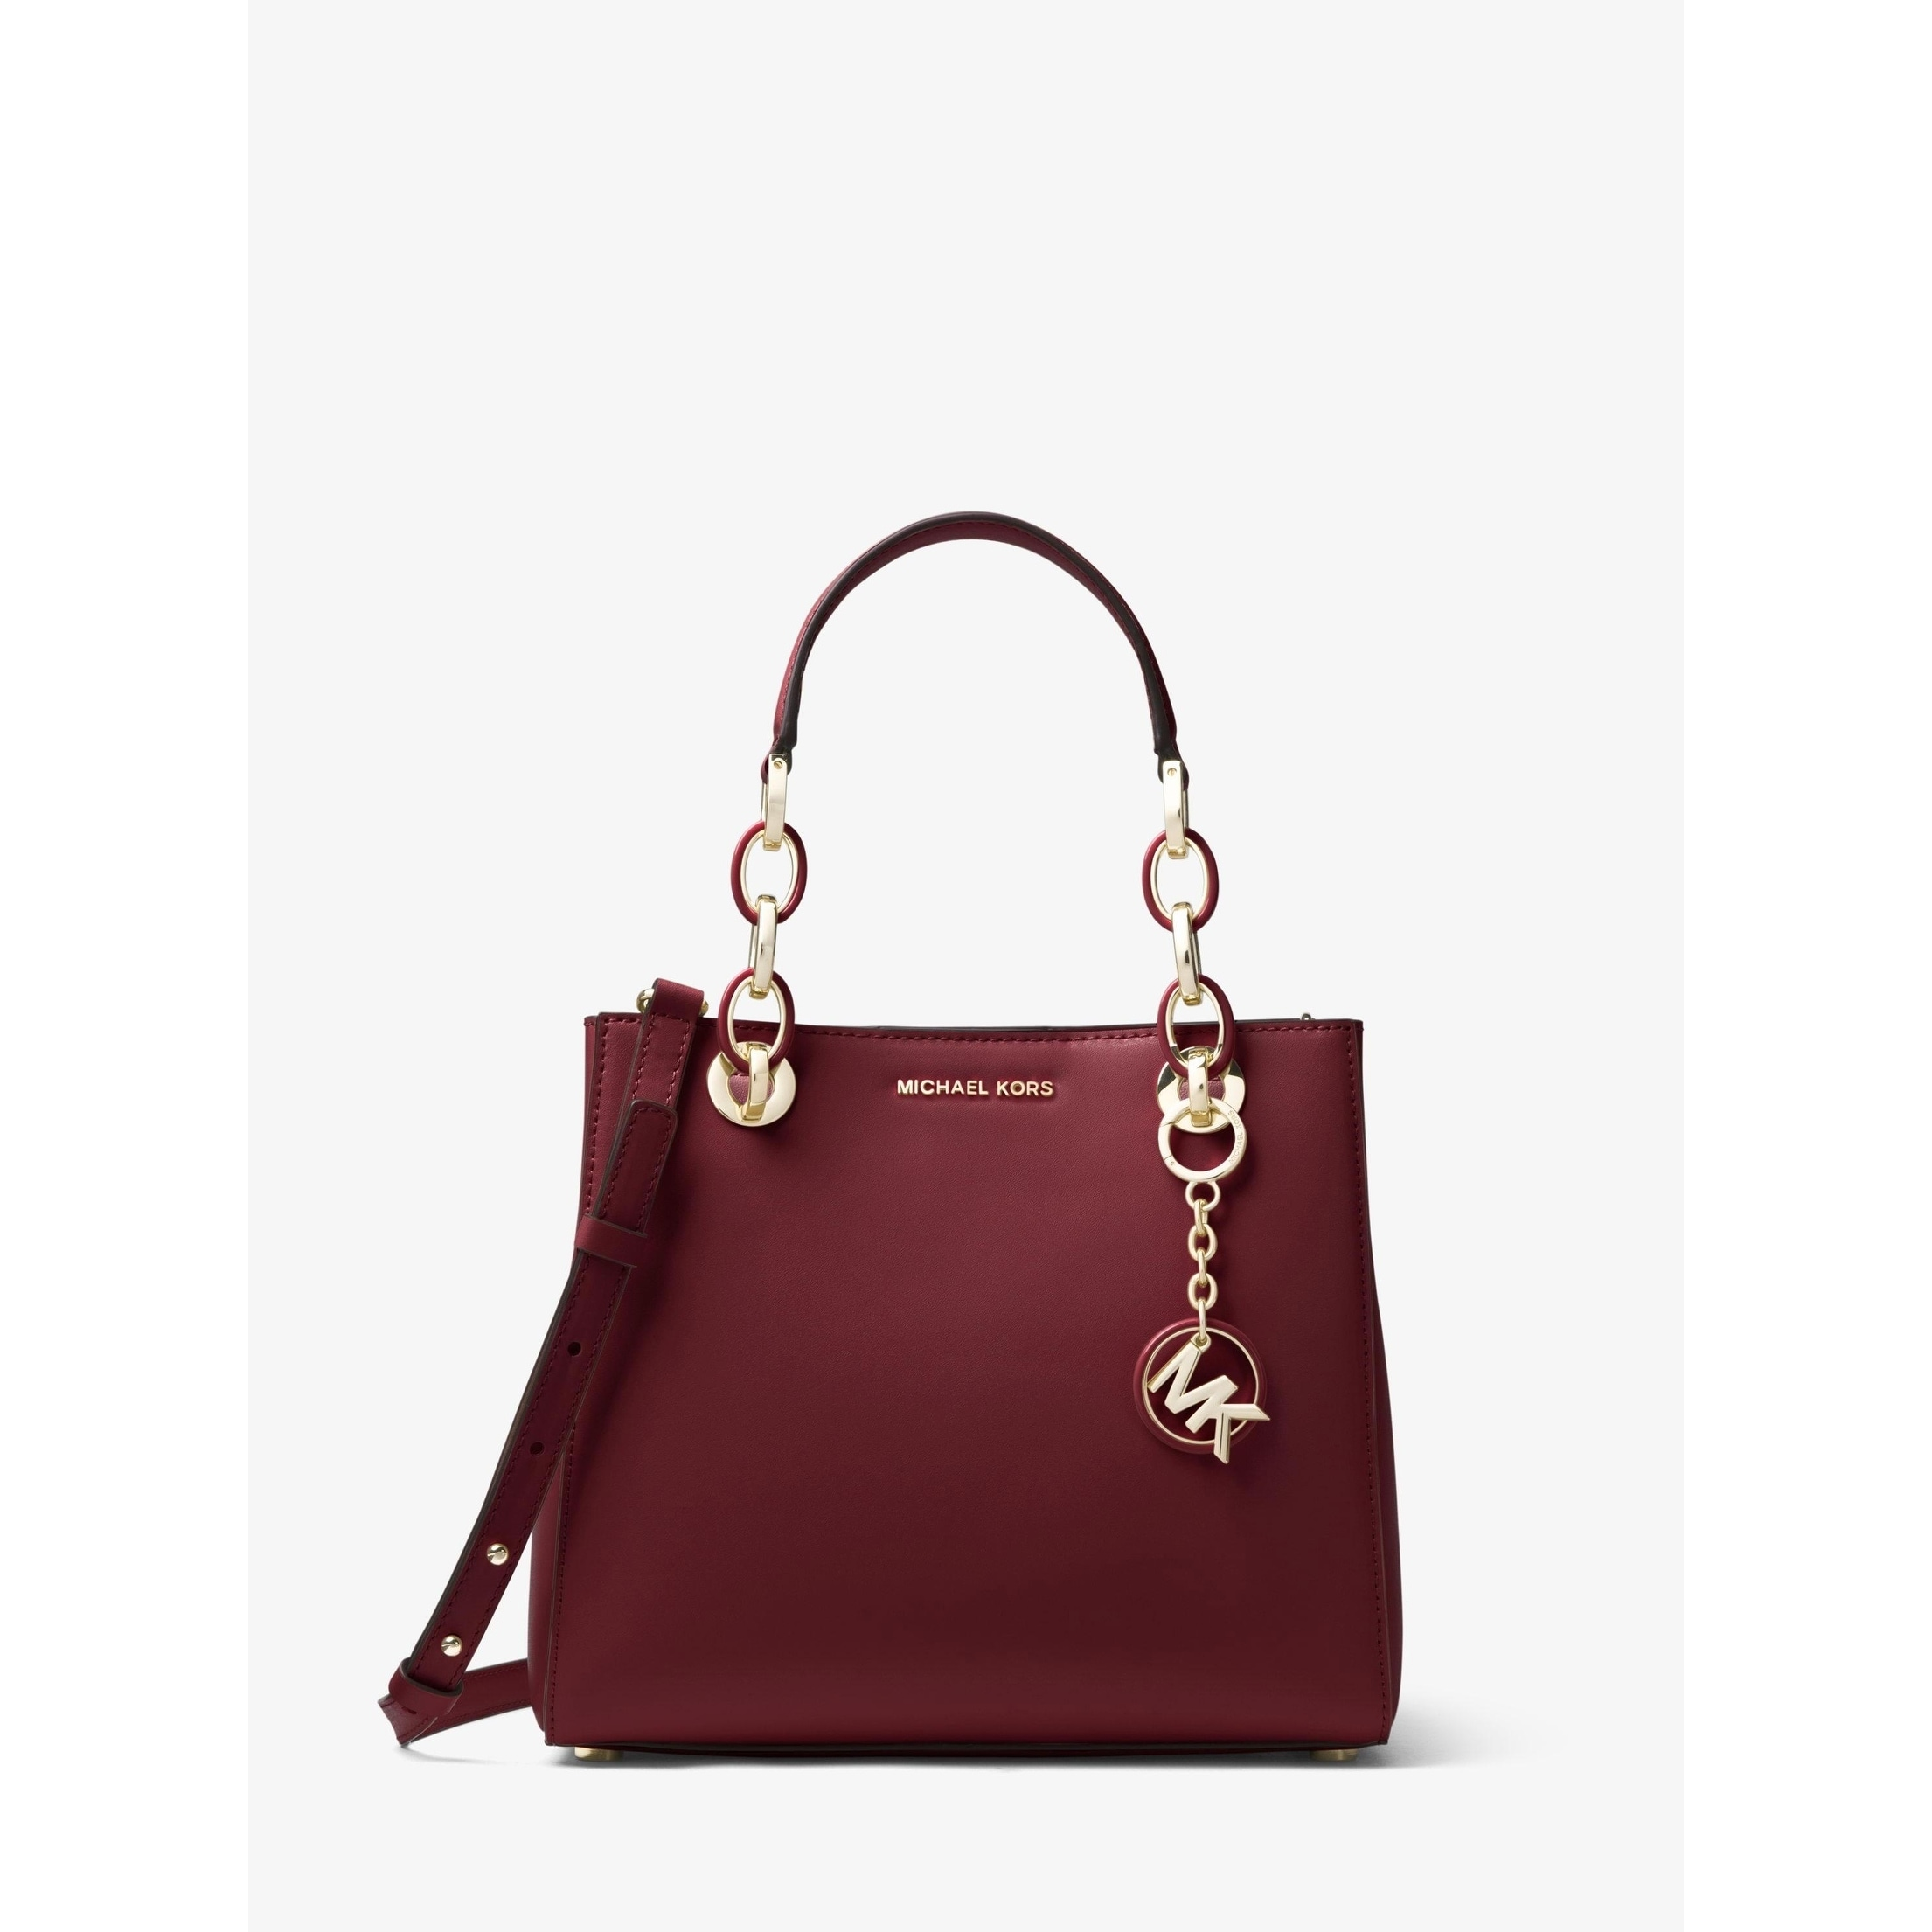 821817bc9c Shop Michael Kors Cynthia Dressy Leather Satchel Bag Oxblood - Free ...